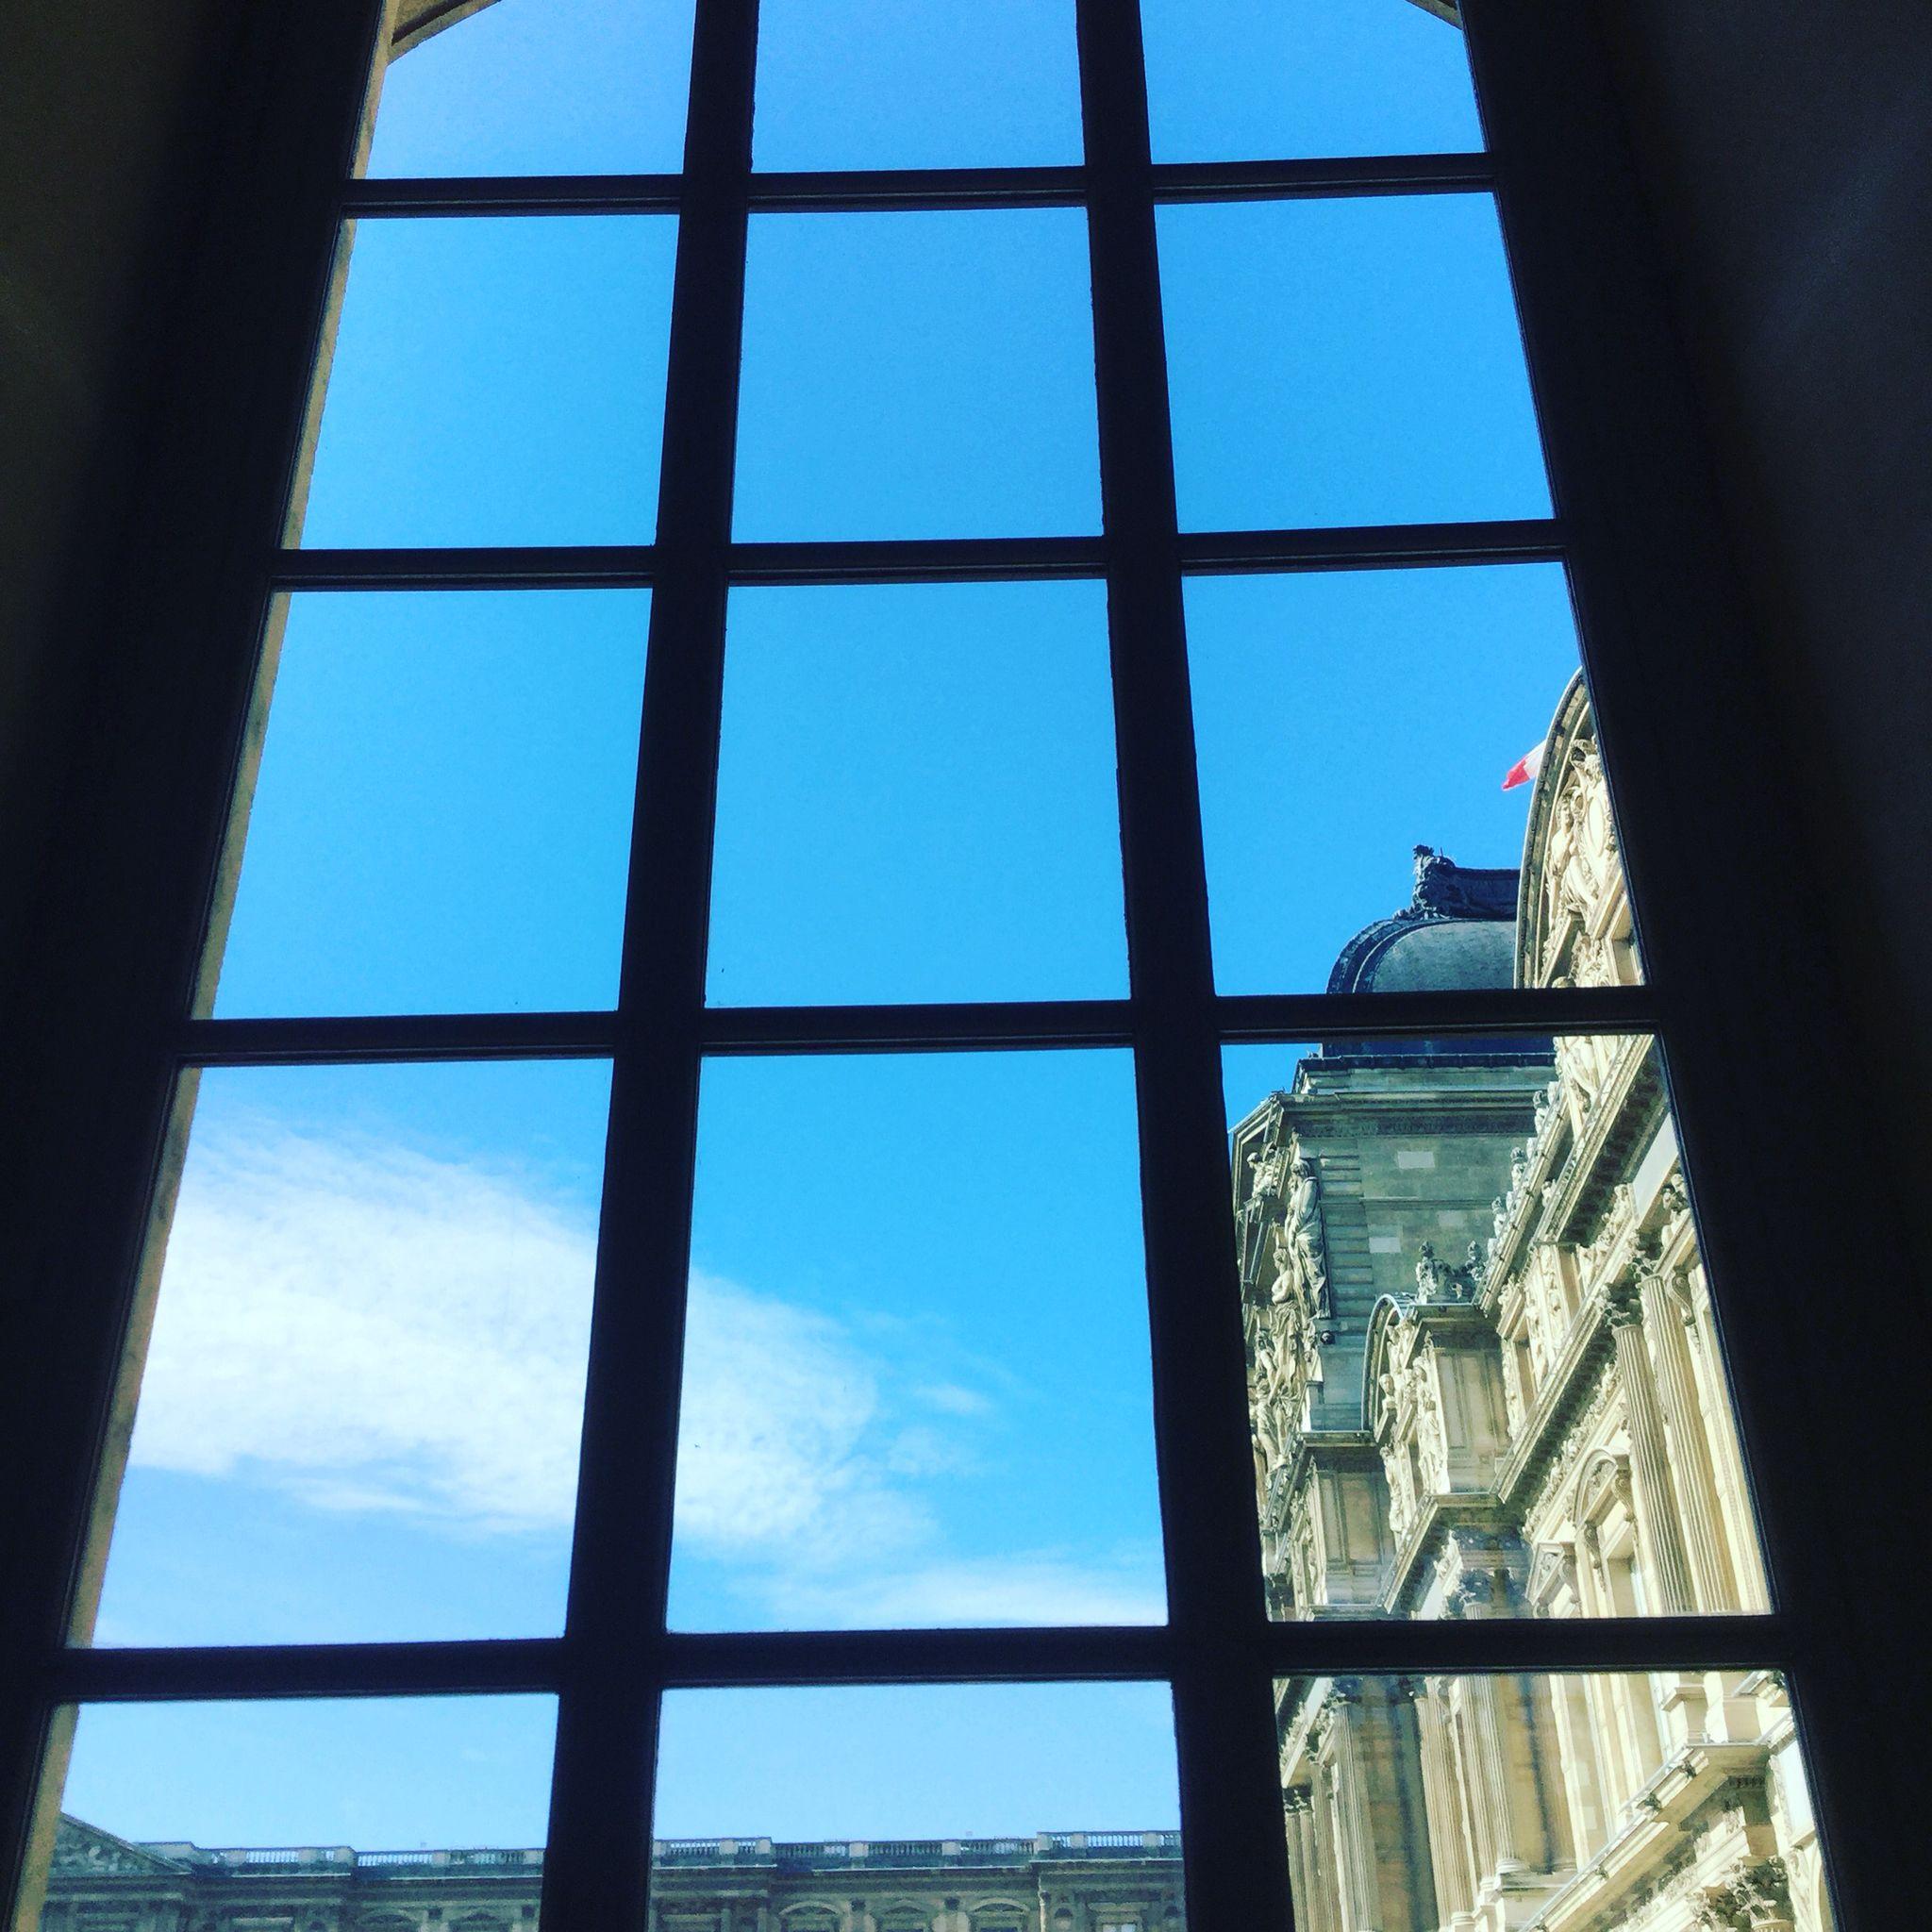 Louvre through a window